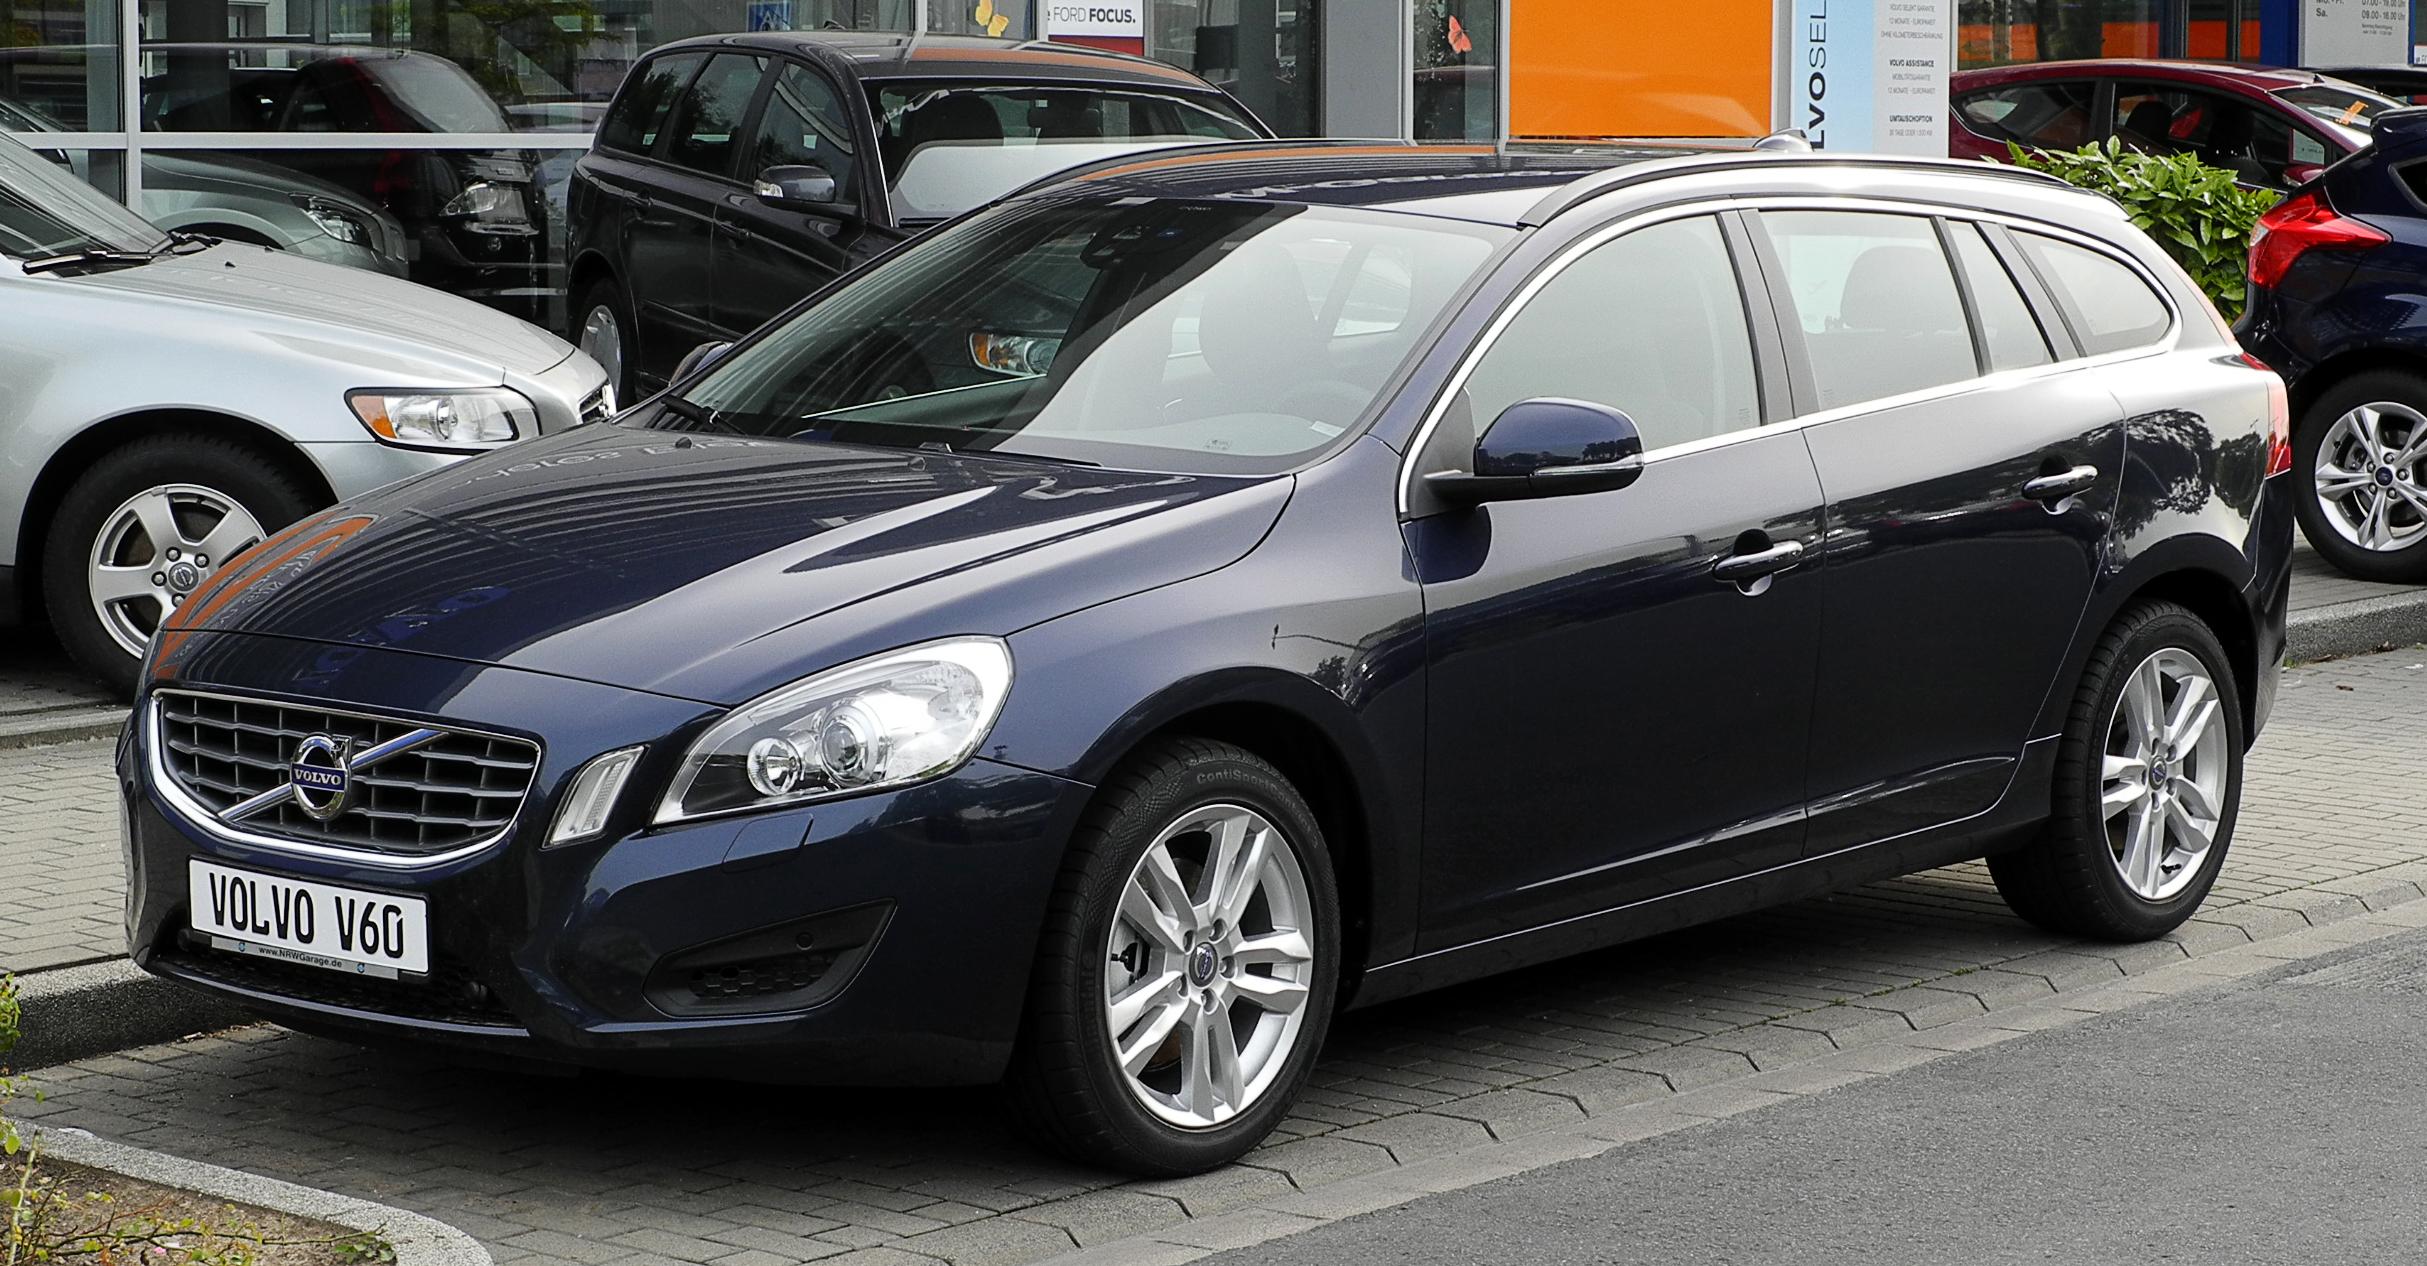 Datei:Volvo_V60_%E2%80%93_Frontansicht,_12._Juni_2011,_D%C3%BCsseldorfon 2012 Volvo S60 R Design